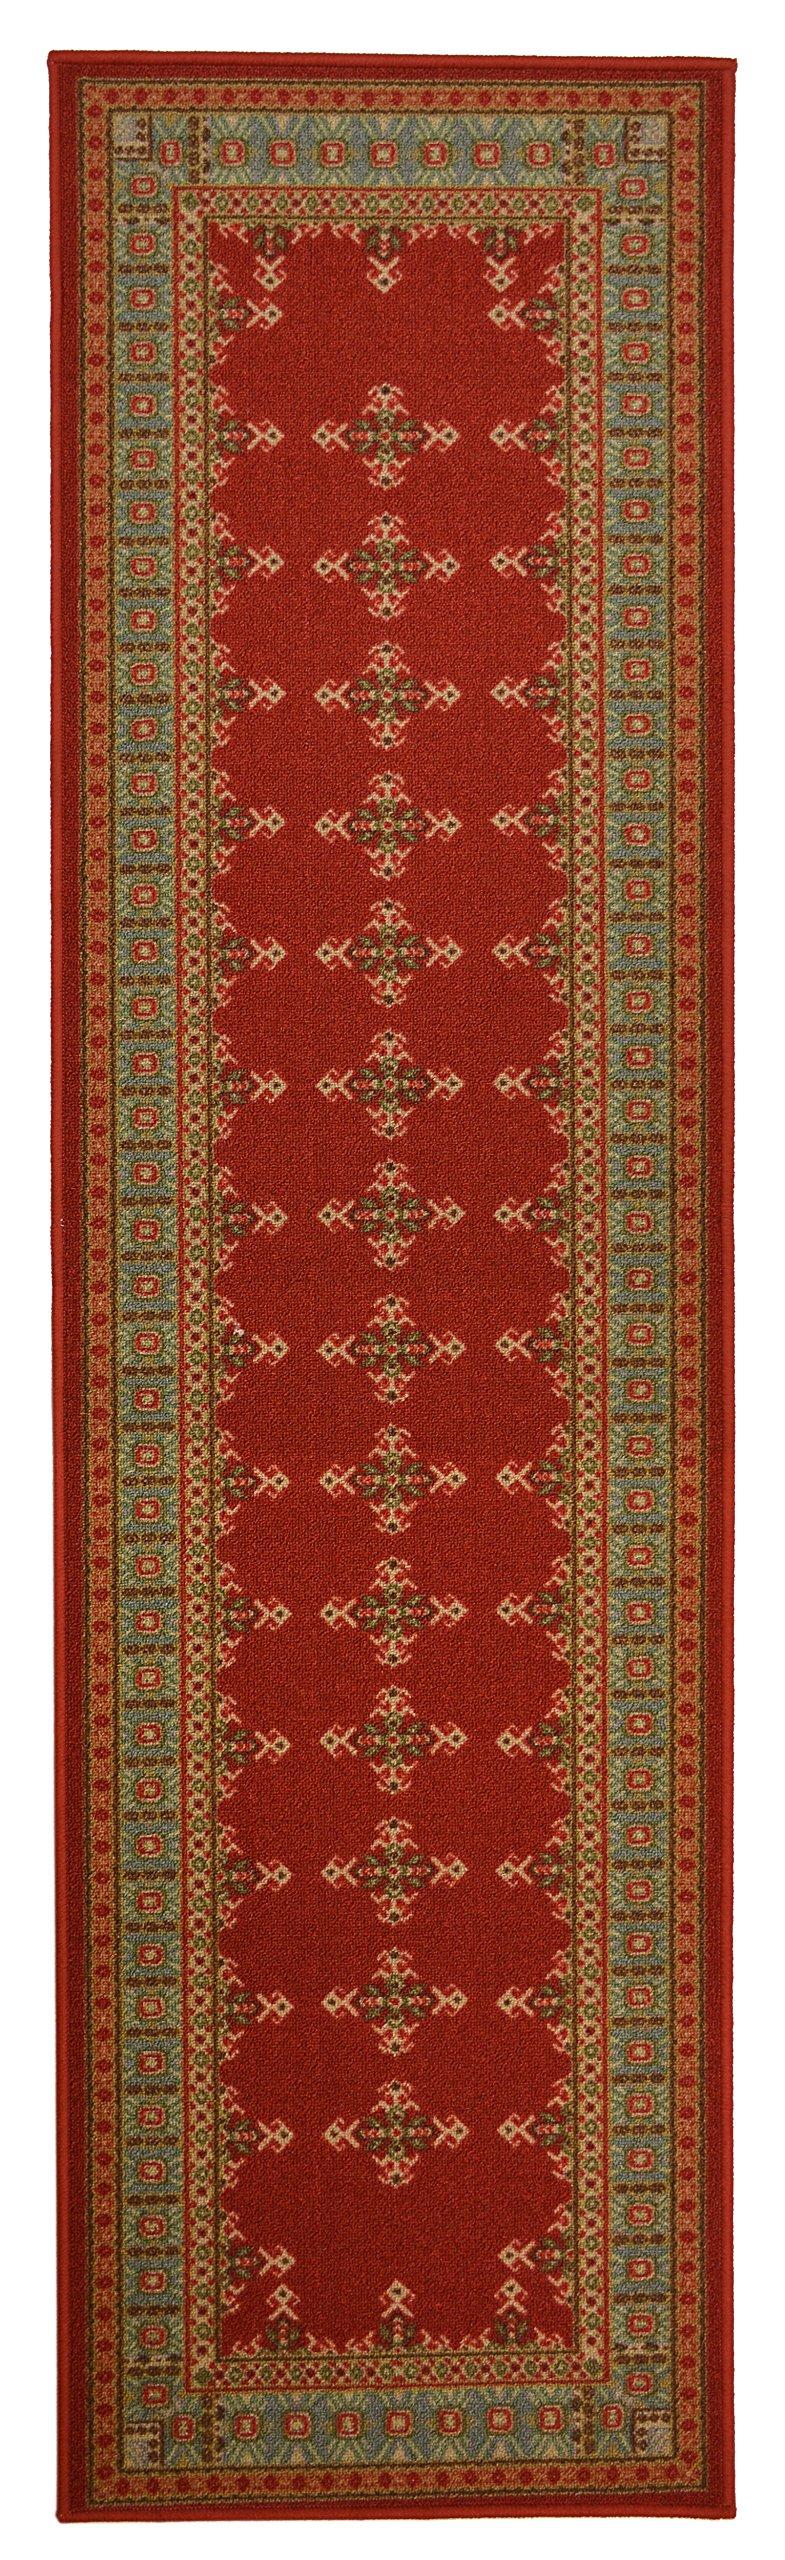 Traditional Kilim Design Runner Rug For Kitchen Hallway Laundry Room Entry Slip Skid Resistant Rubber Backing (Red, 2x7)